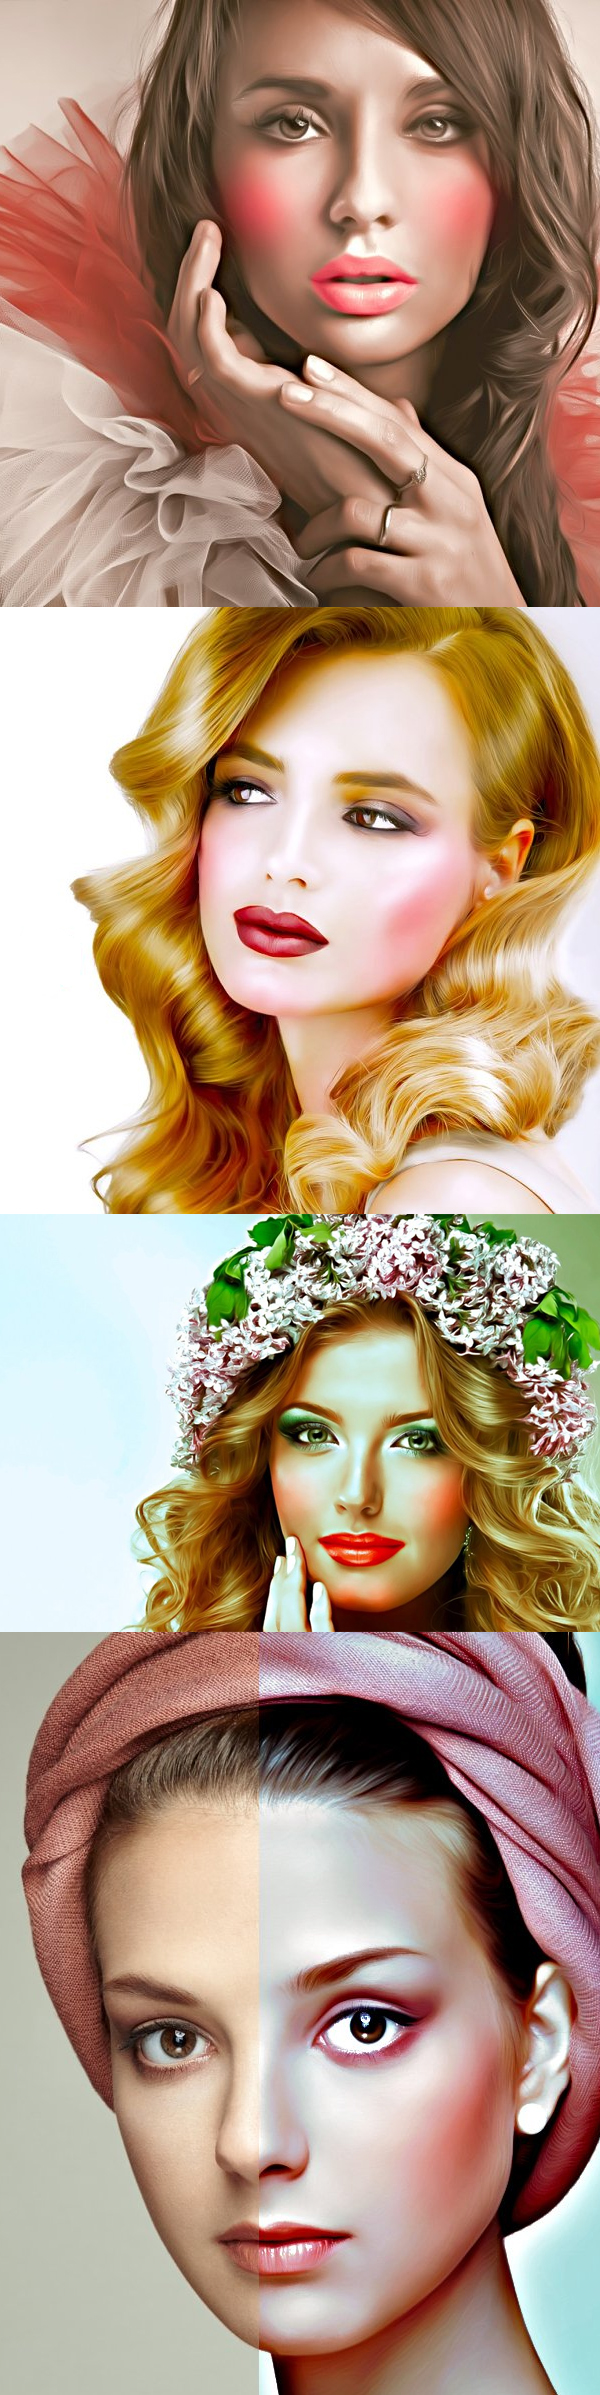 Skin Makeup Retouching Photoshop Action